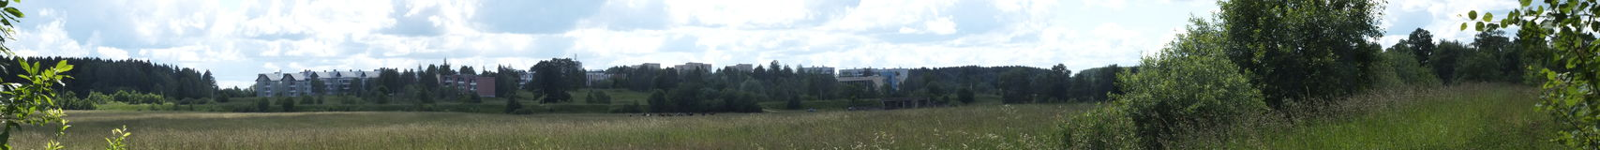 View of settlement Belorusskiy. Royalty Free Stock Photos